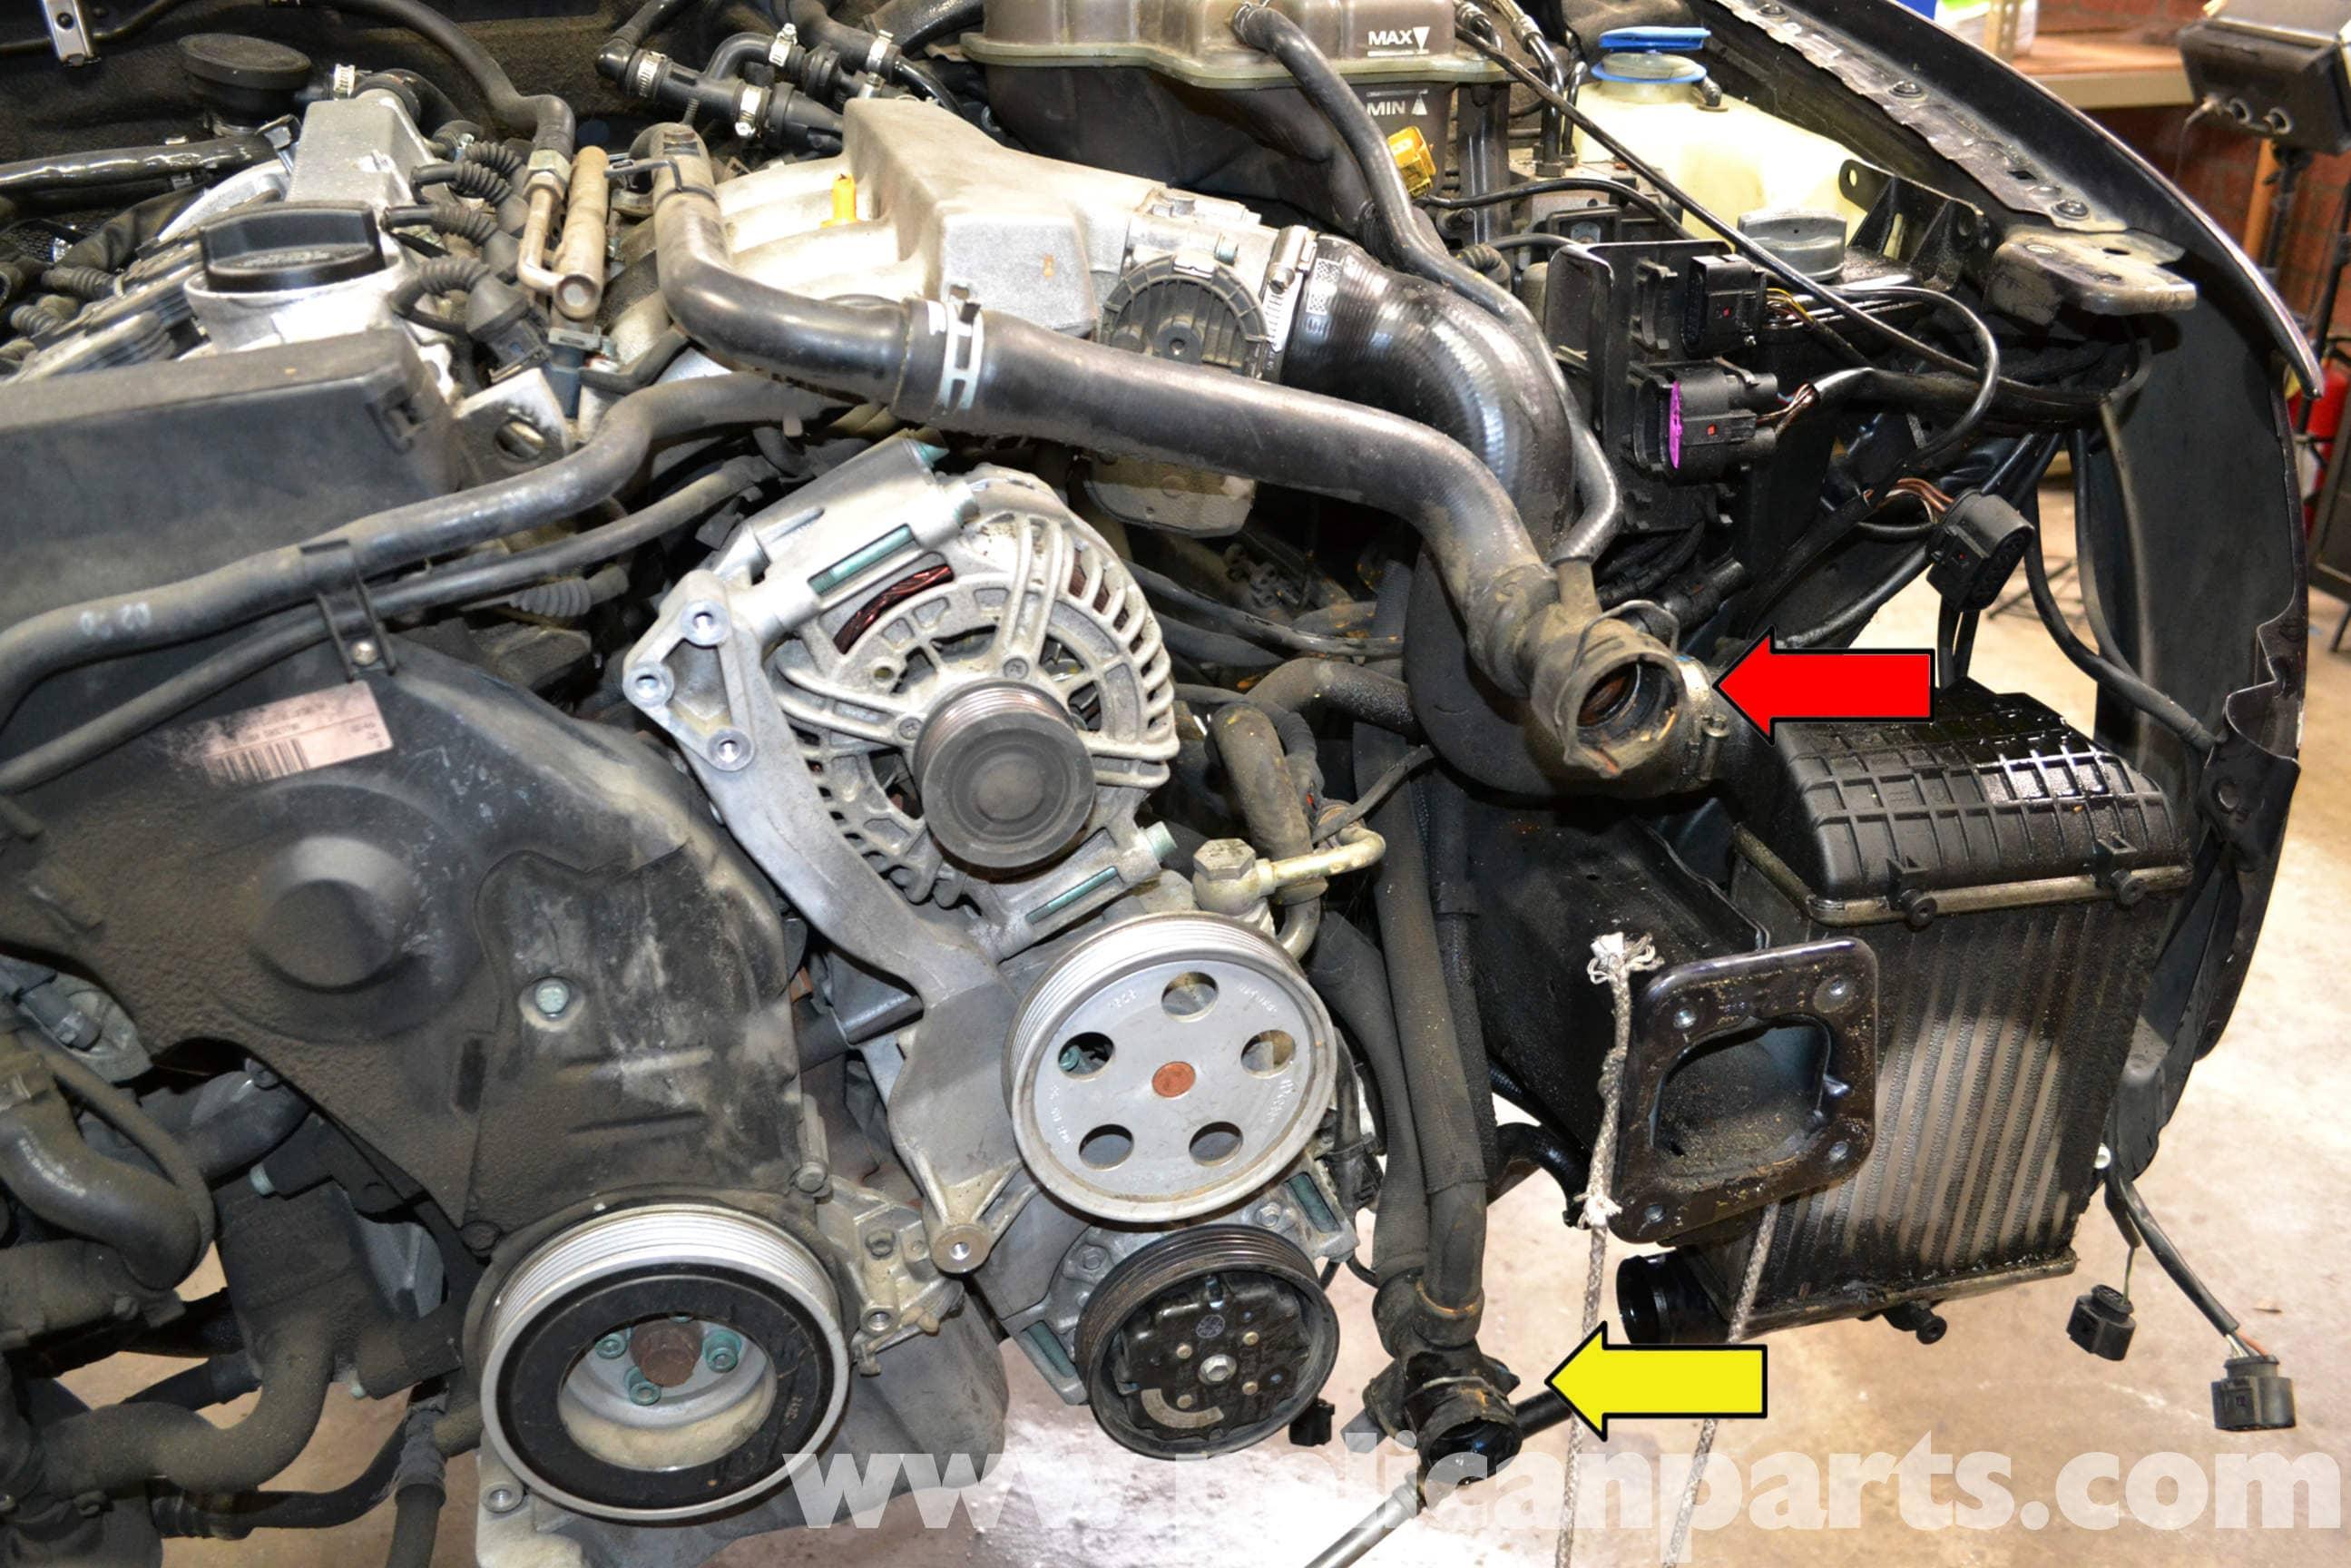 MA_9473] Volkswagen Jetta 2 5 Engine Diagram Free DiagramAwni Eopsy Peted Oidei Vira Mohammedshrine Librar Wiring 101